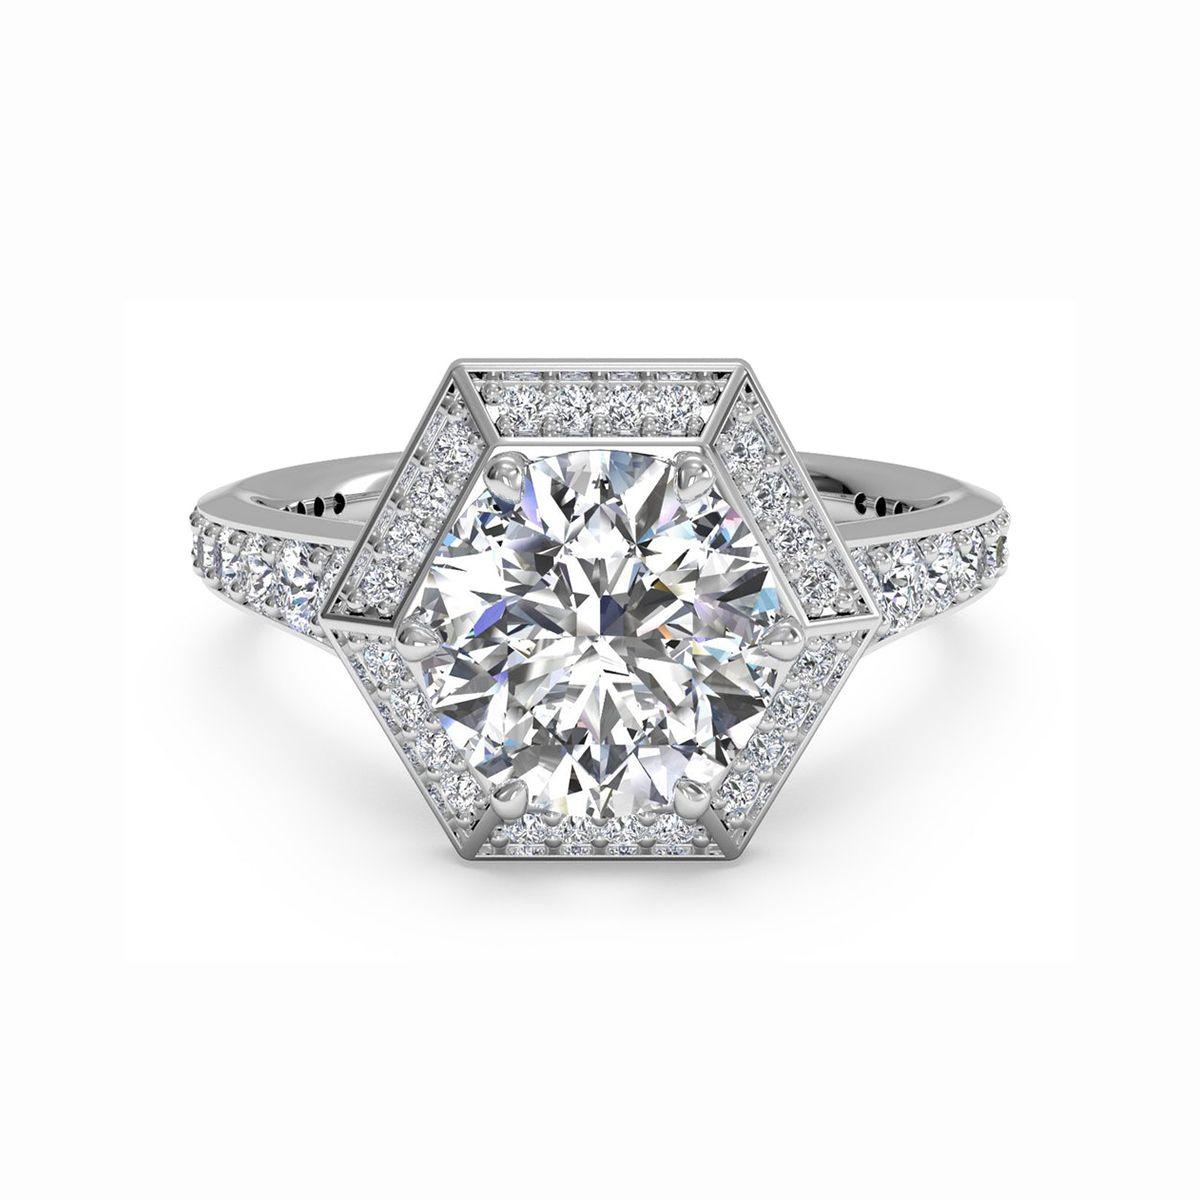 Round-cut diamond prong set with a vaulted diamond hexagonal halo and diamond band